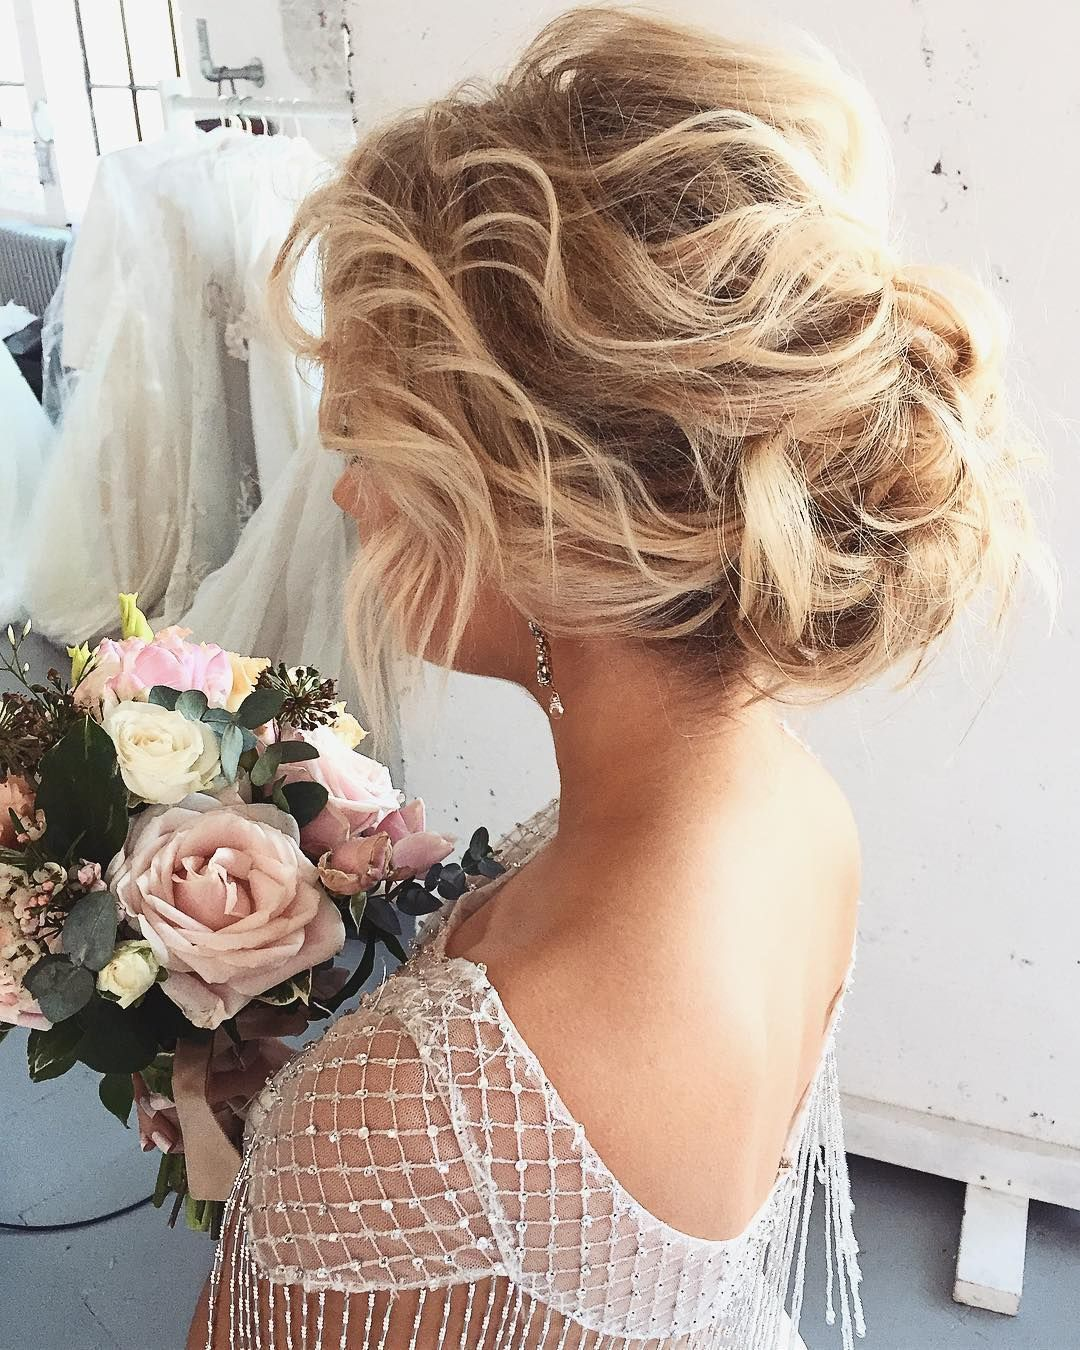 Elegant Updo Wedding Hairstyles Spring 2015: Textured Updo, Updo Wedding Hairstyles,updo Hairstyles